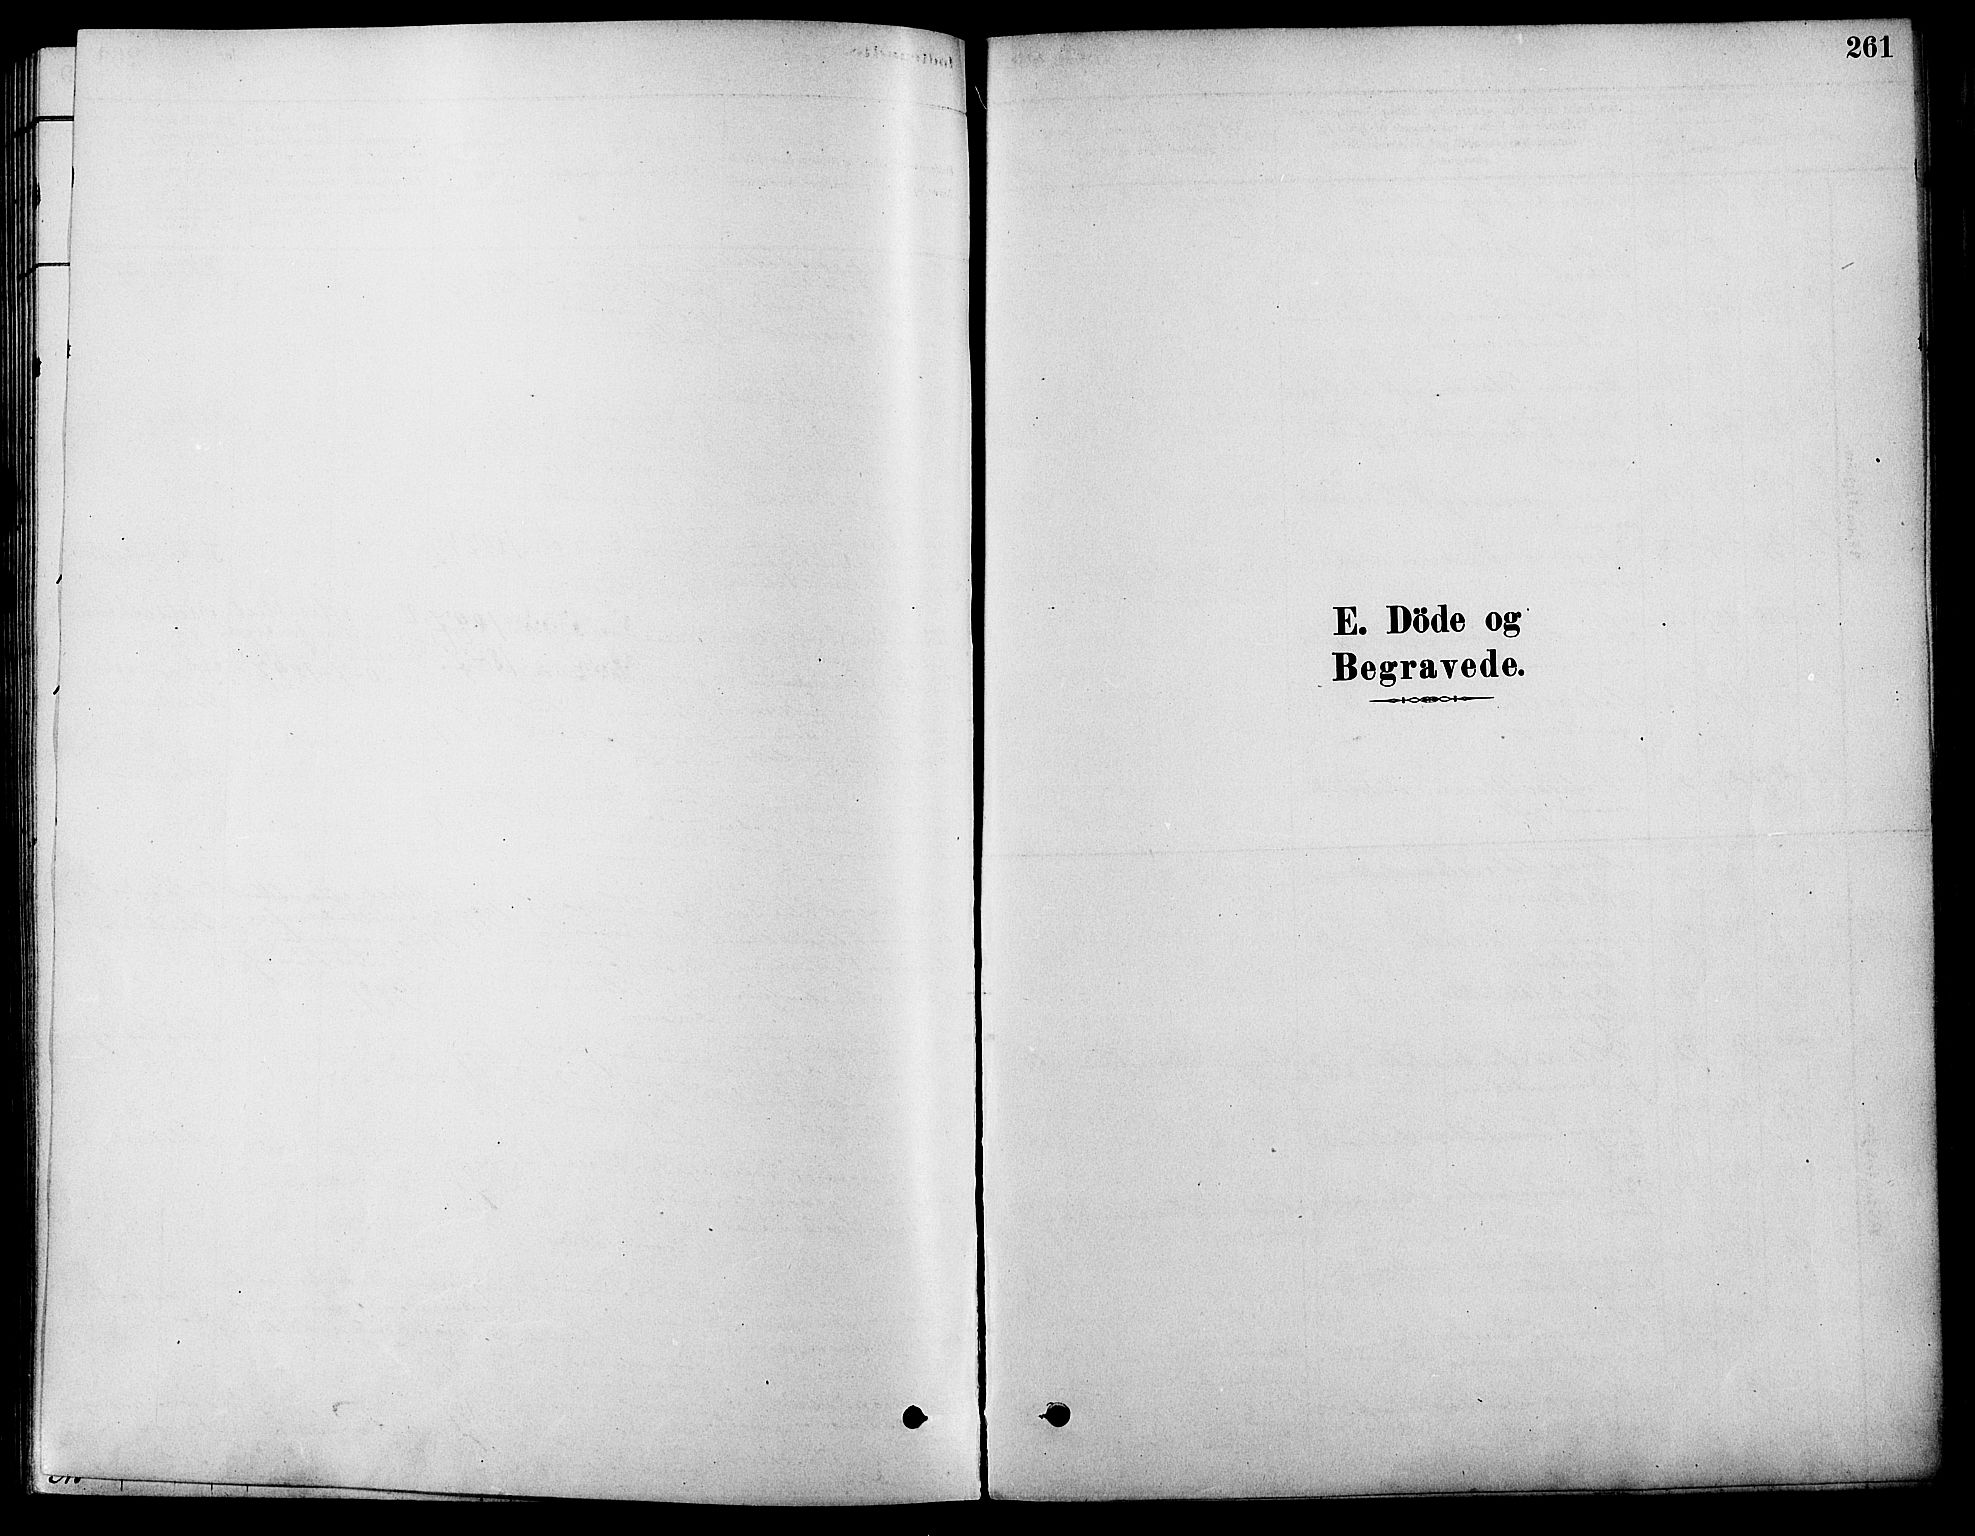 SAH, Fåberg prestekontor, Ministerialbok nr. 8, 1879-1898, s. 261